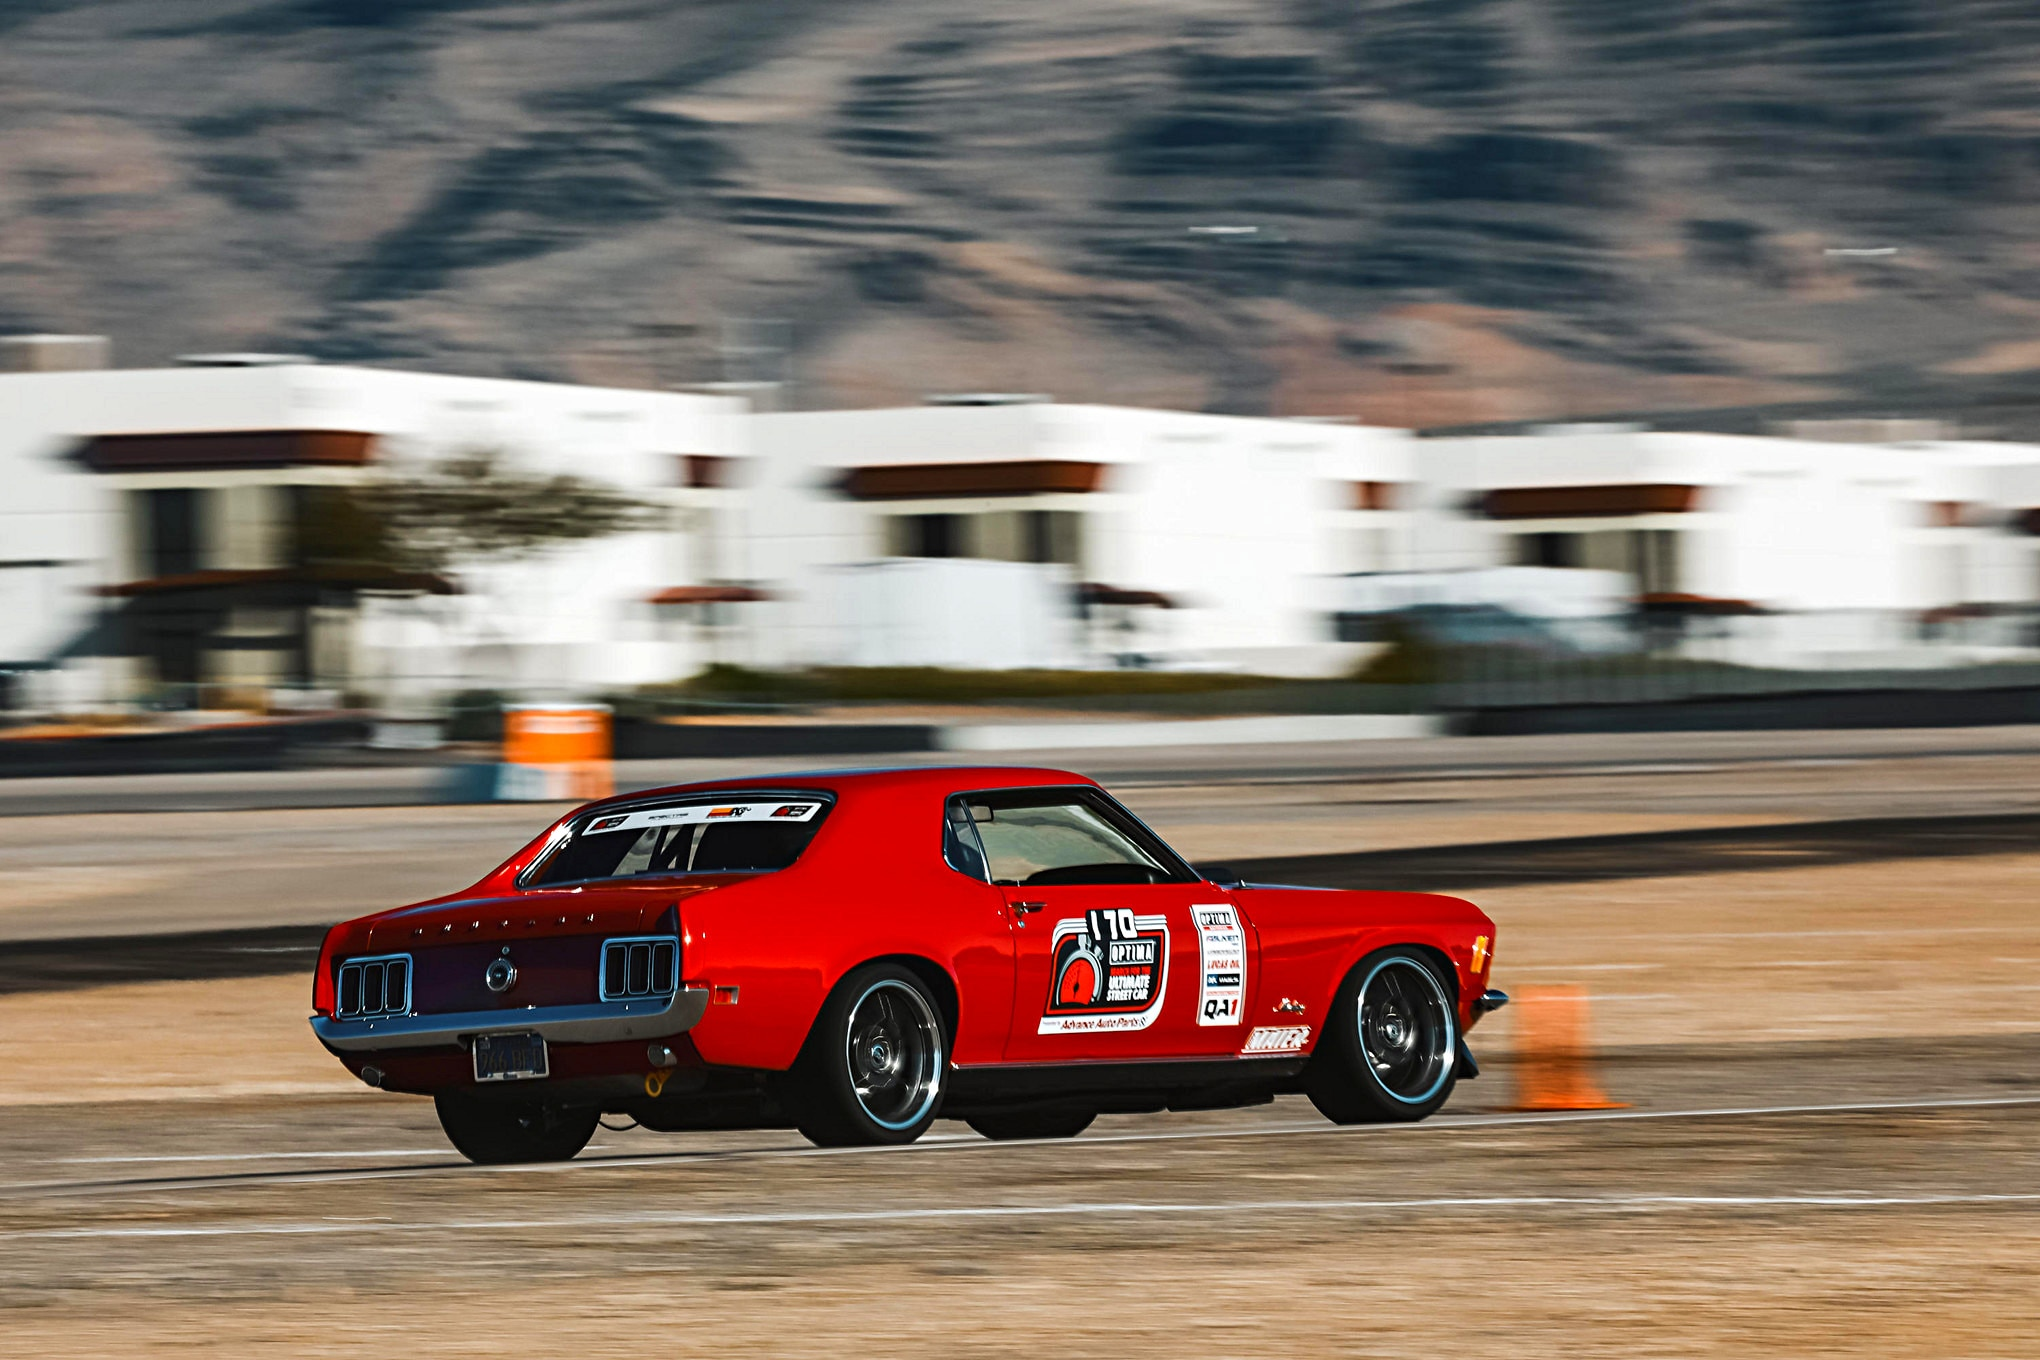 MMFF Mike Lofstrom 1970 Ford Mustang DriveOPTIMA Las Vegas 2019  59